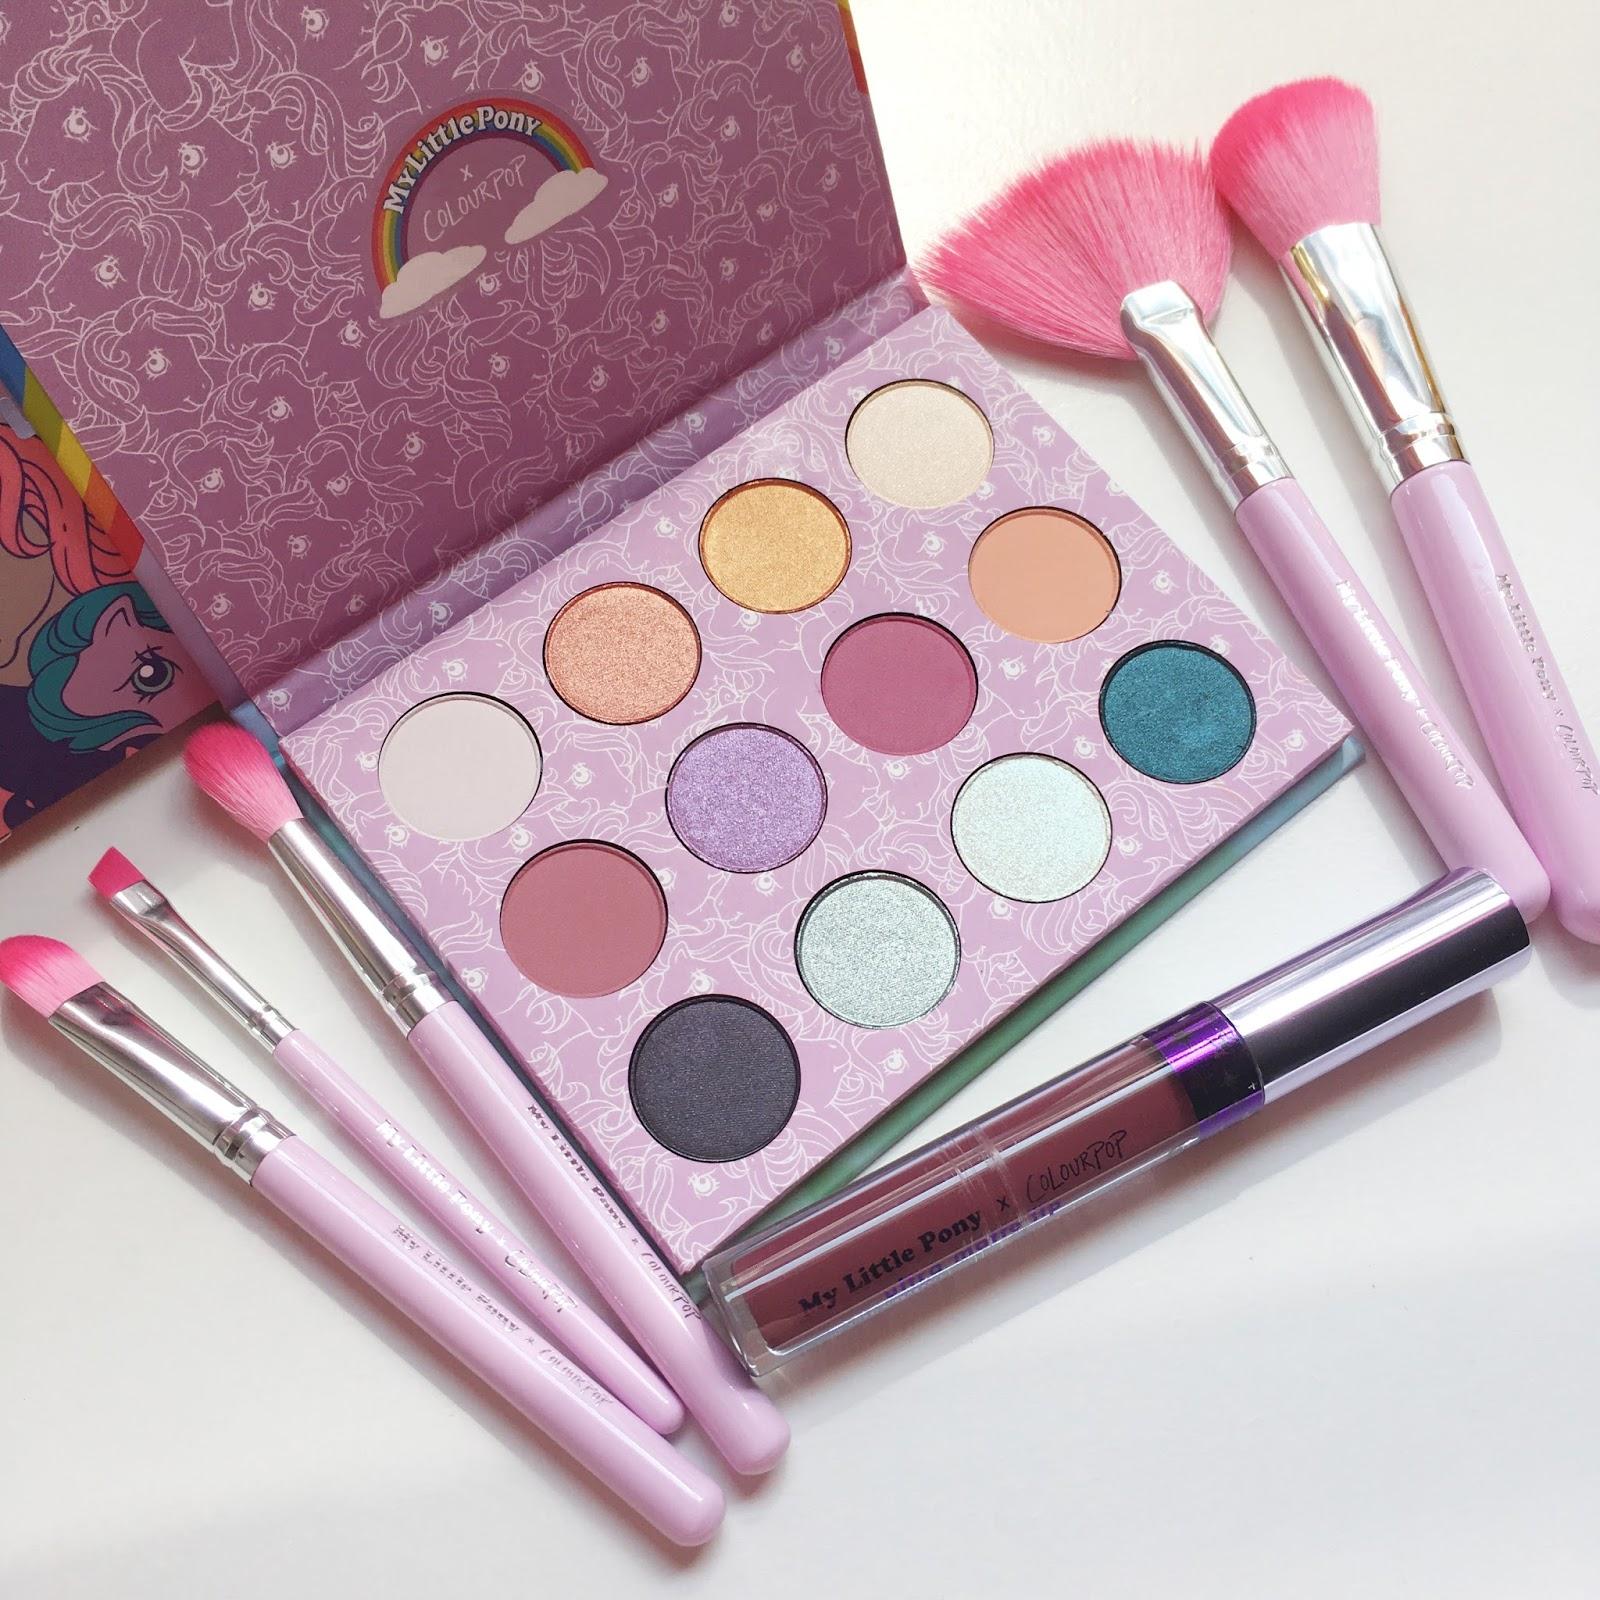 Marshmallow Beauty Blog Reviews Colourpop My Little Pony Palette Review